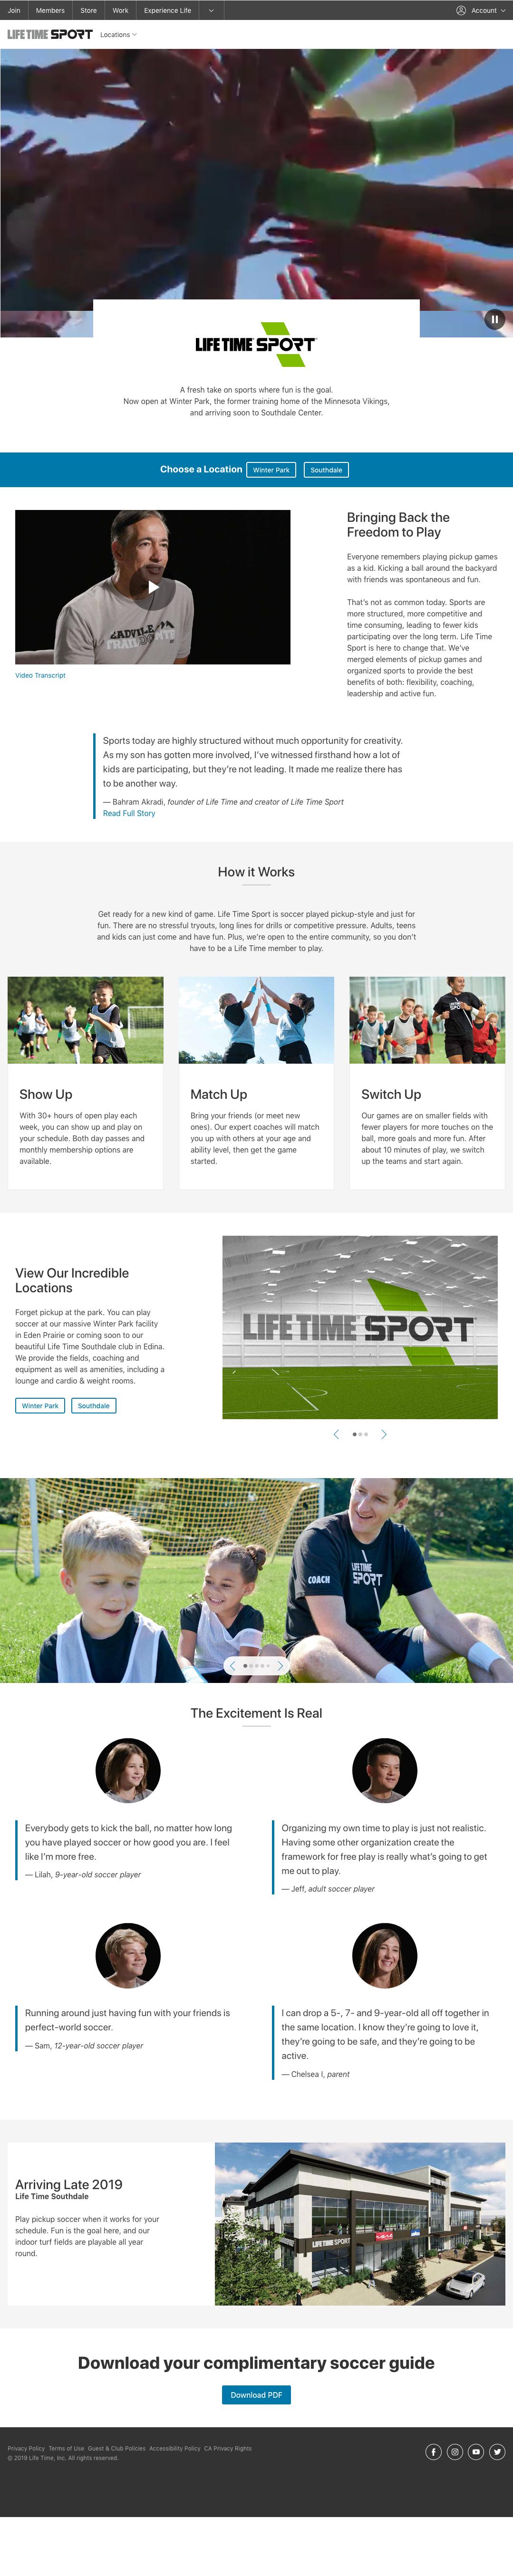 FireShot Capture 111 - Pickup Indoor & Outdoor Soccer - Life Time Sport - sport.lifetime.life.png